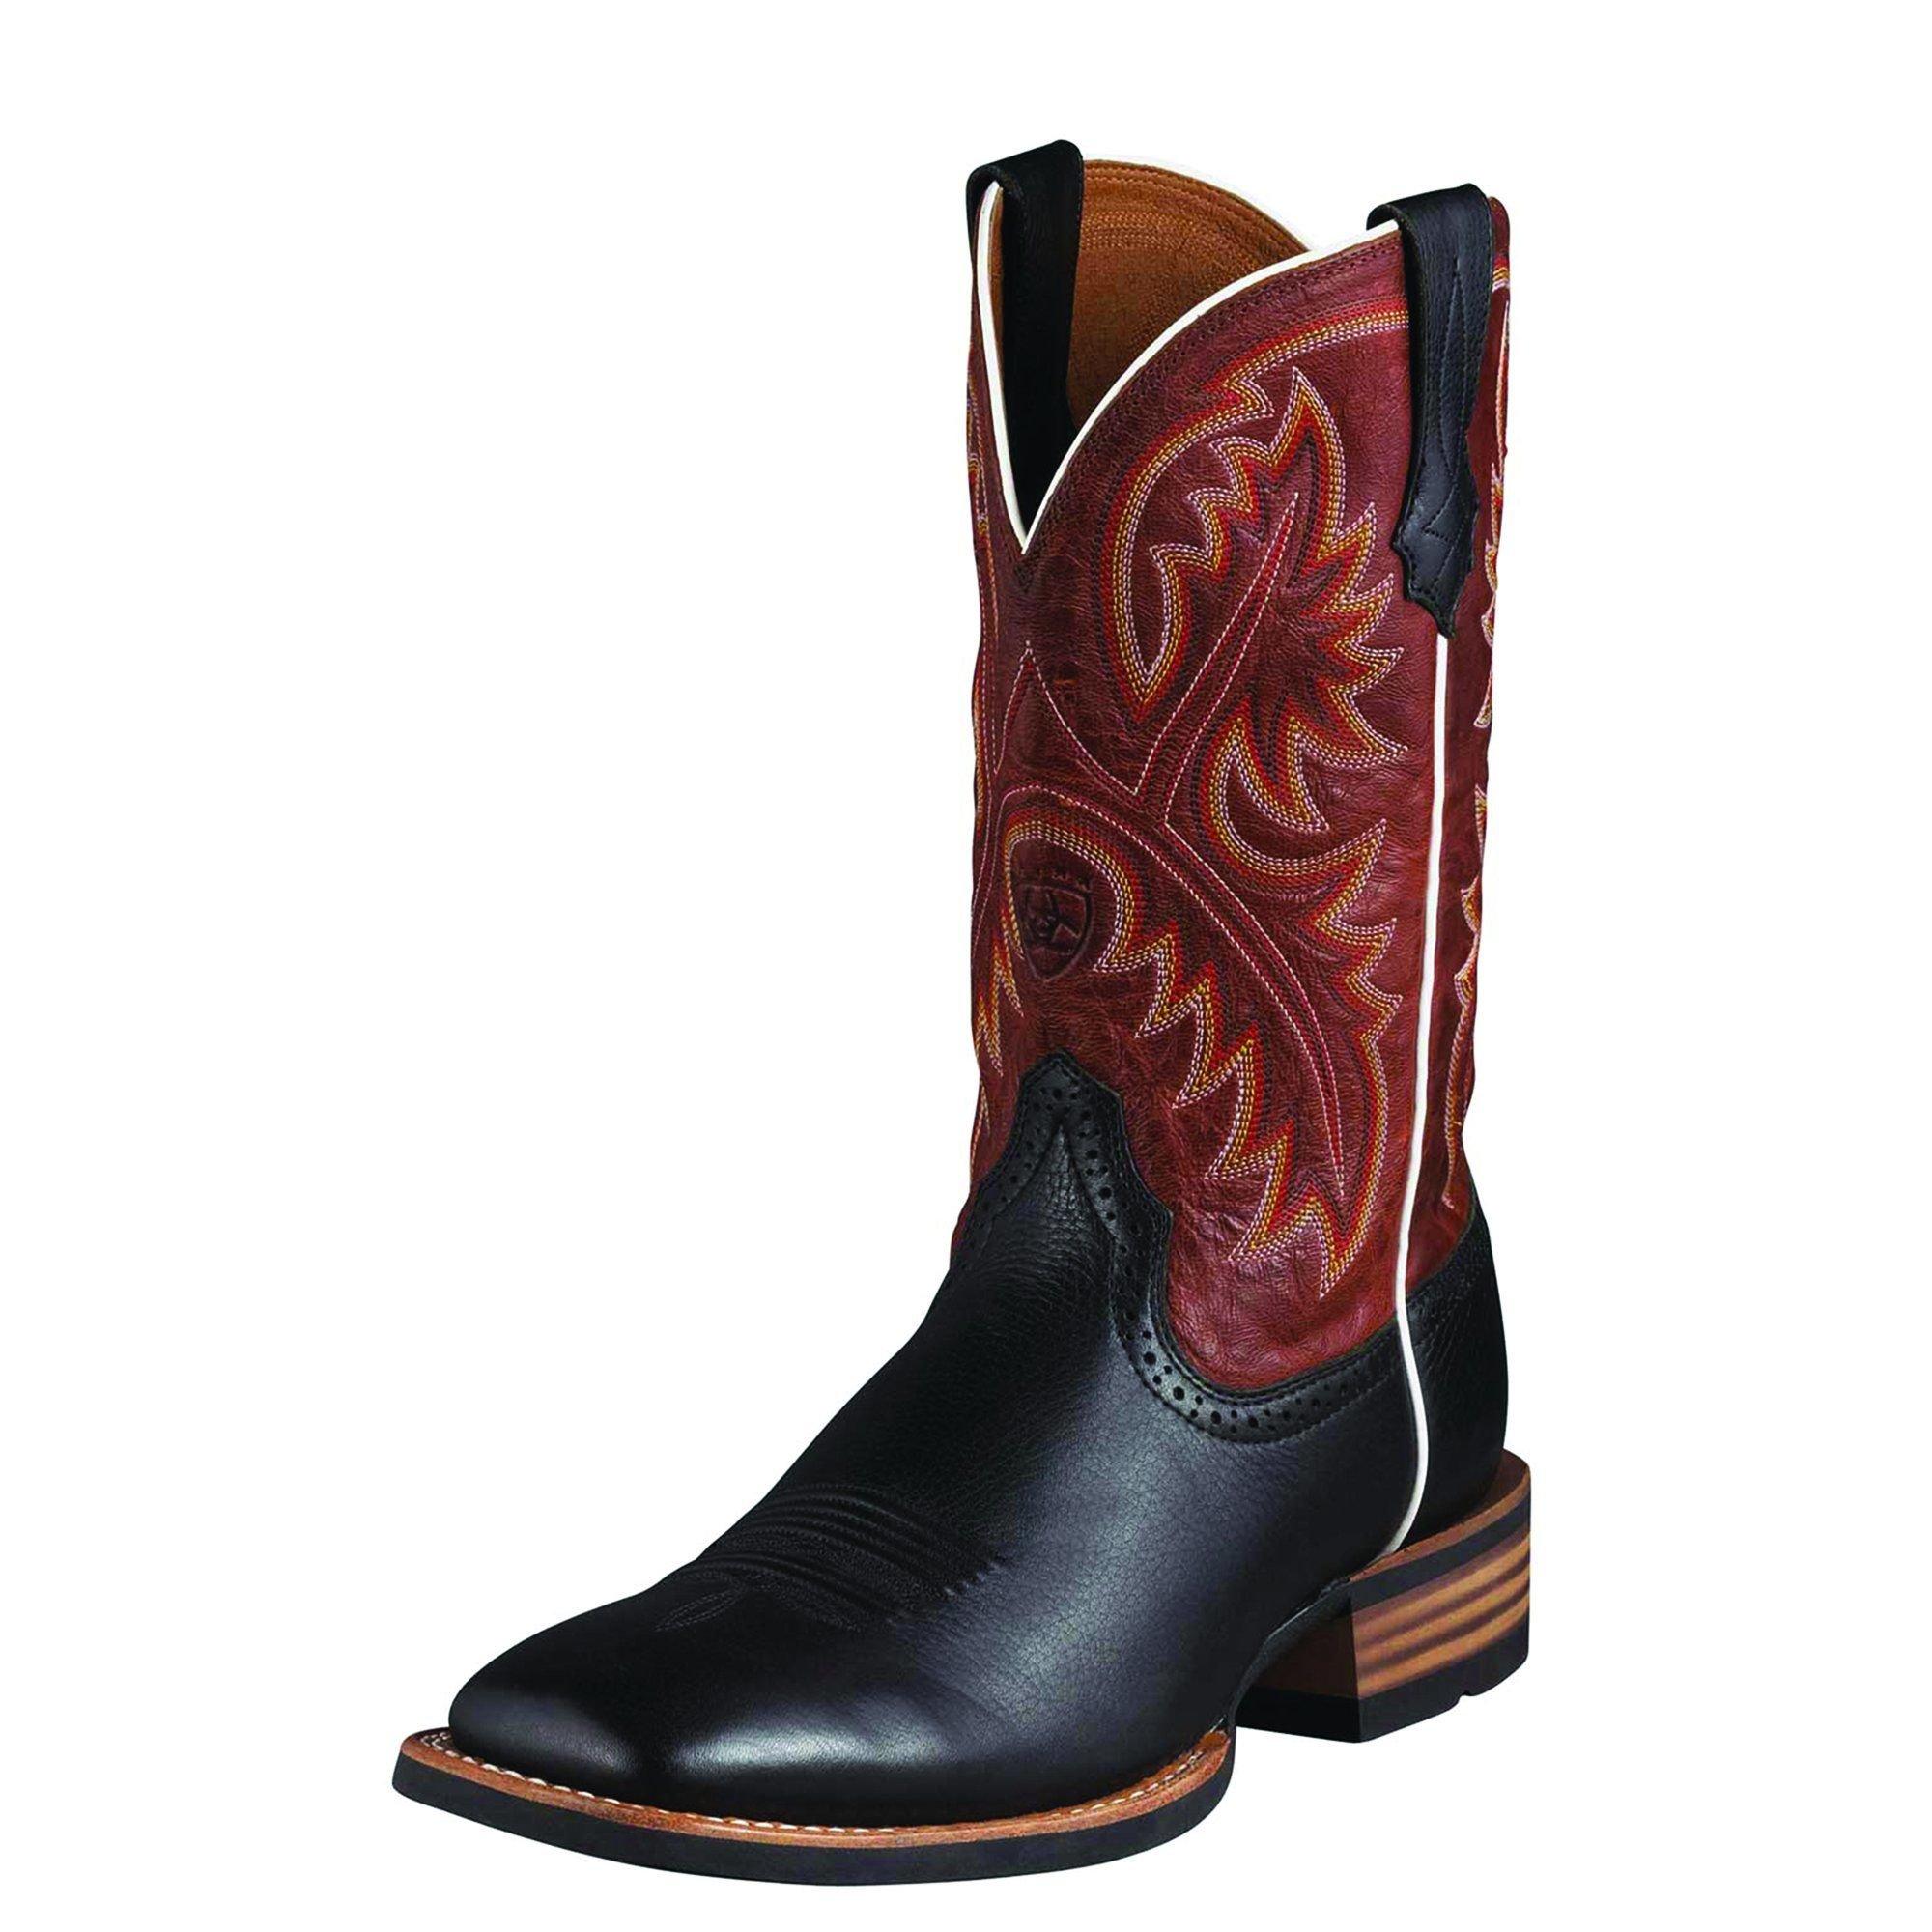 Ariat Men's Quickdraw Western Boot, Black Deer Tan/Washed Adobe, 10 B US